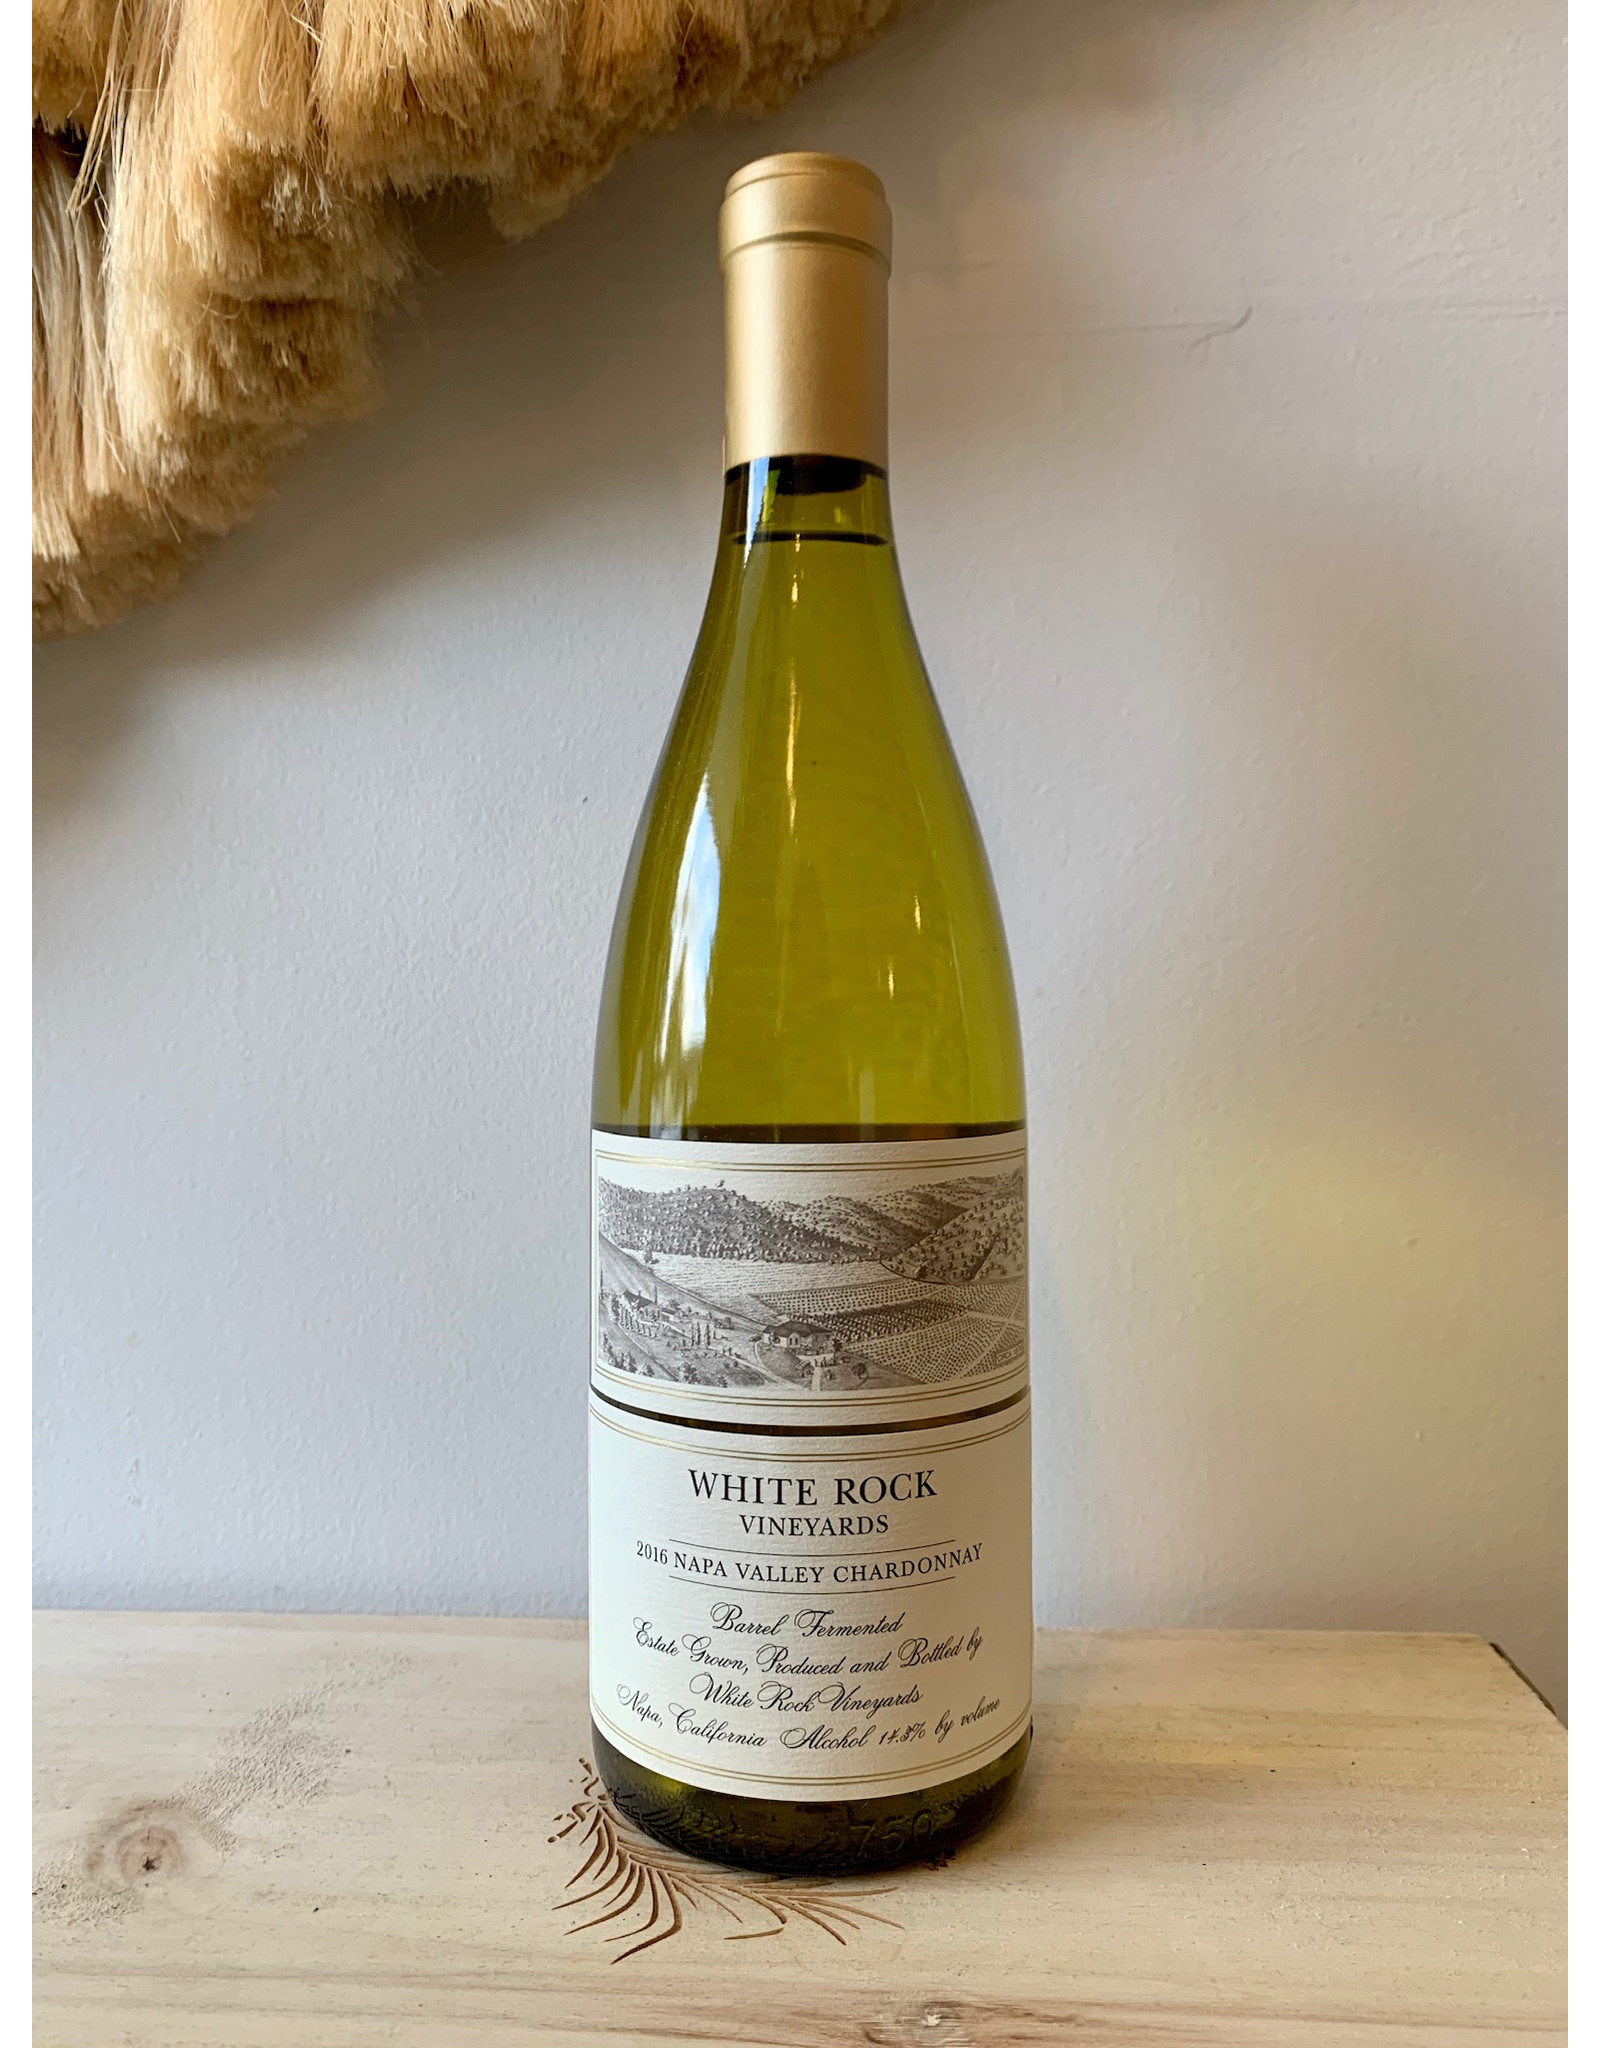 White Rock Napa Valley Chardonnay 2016